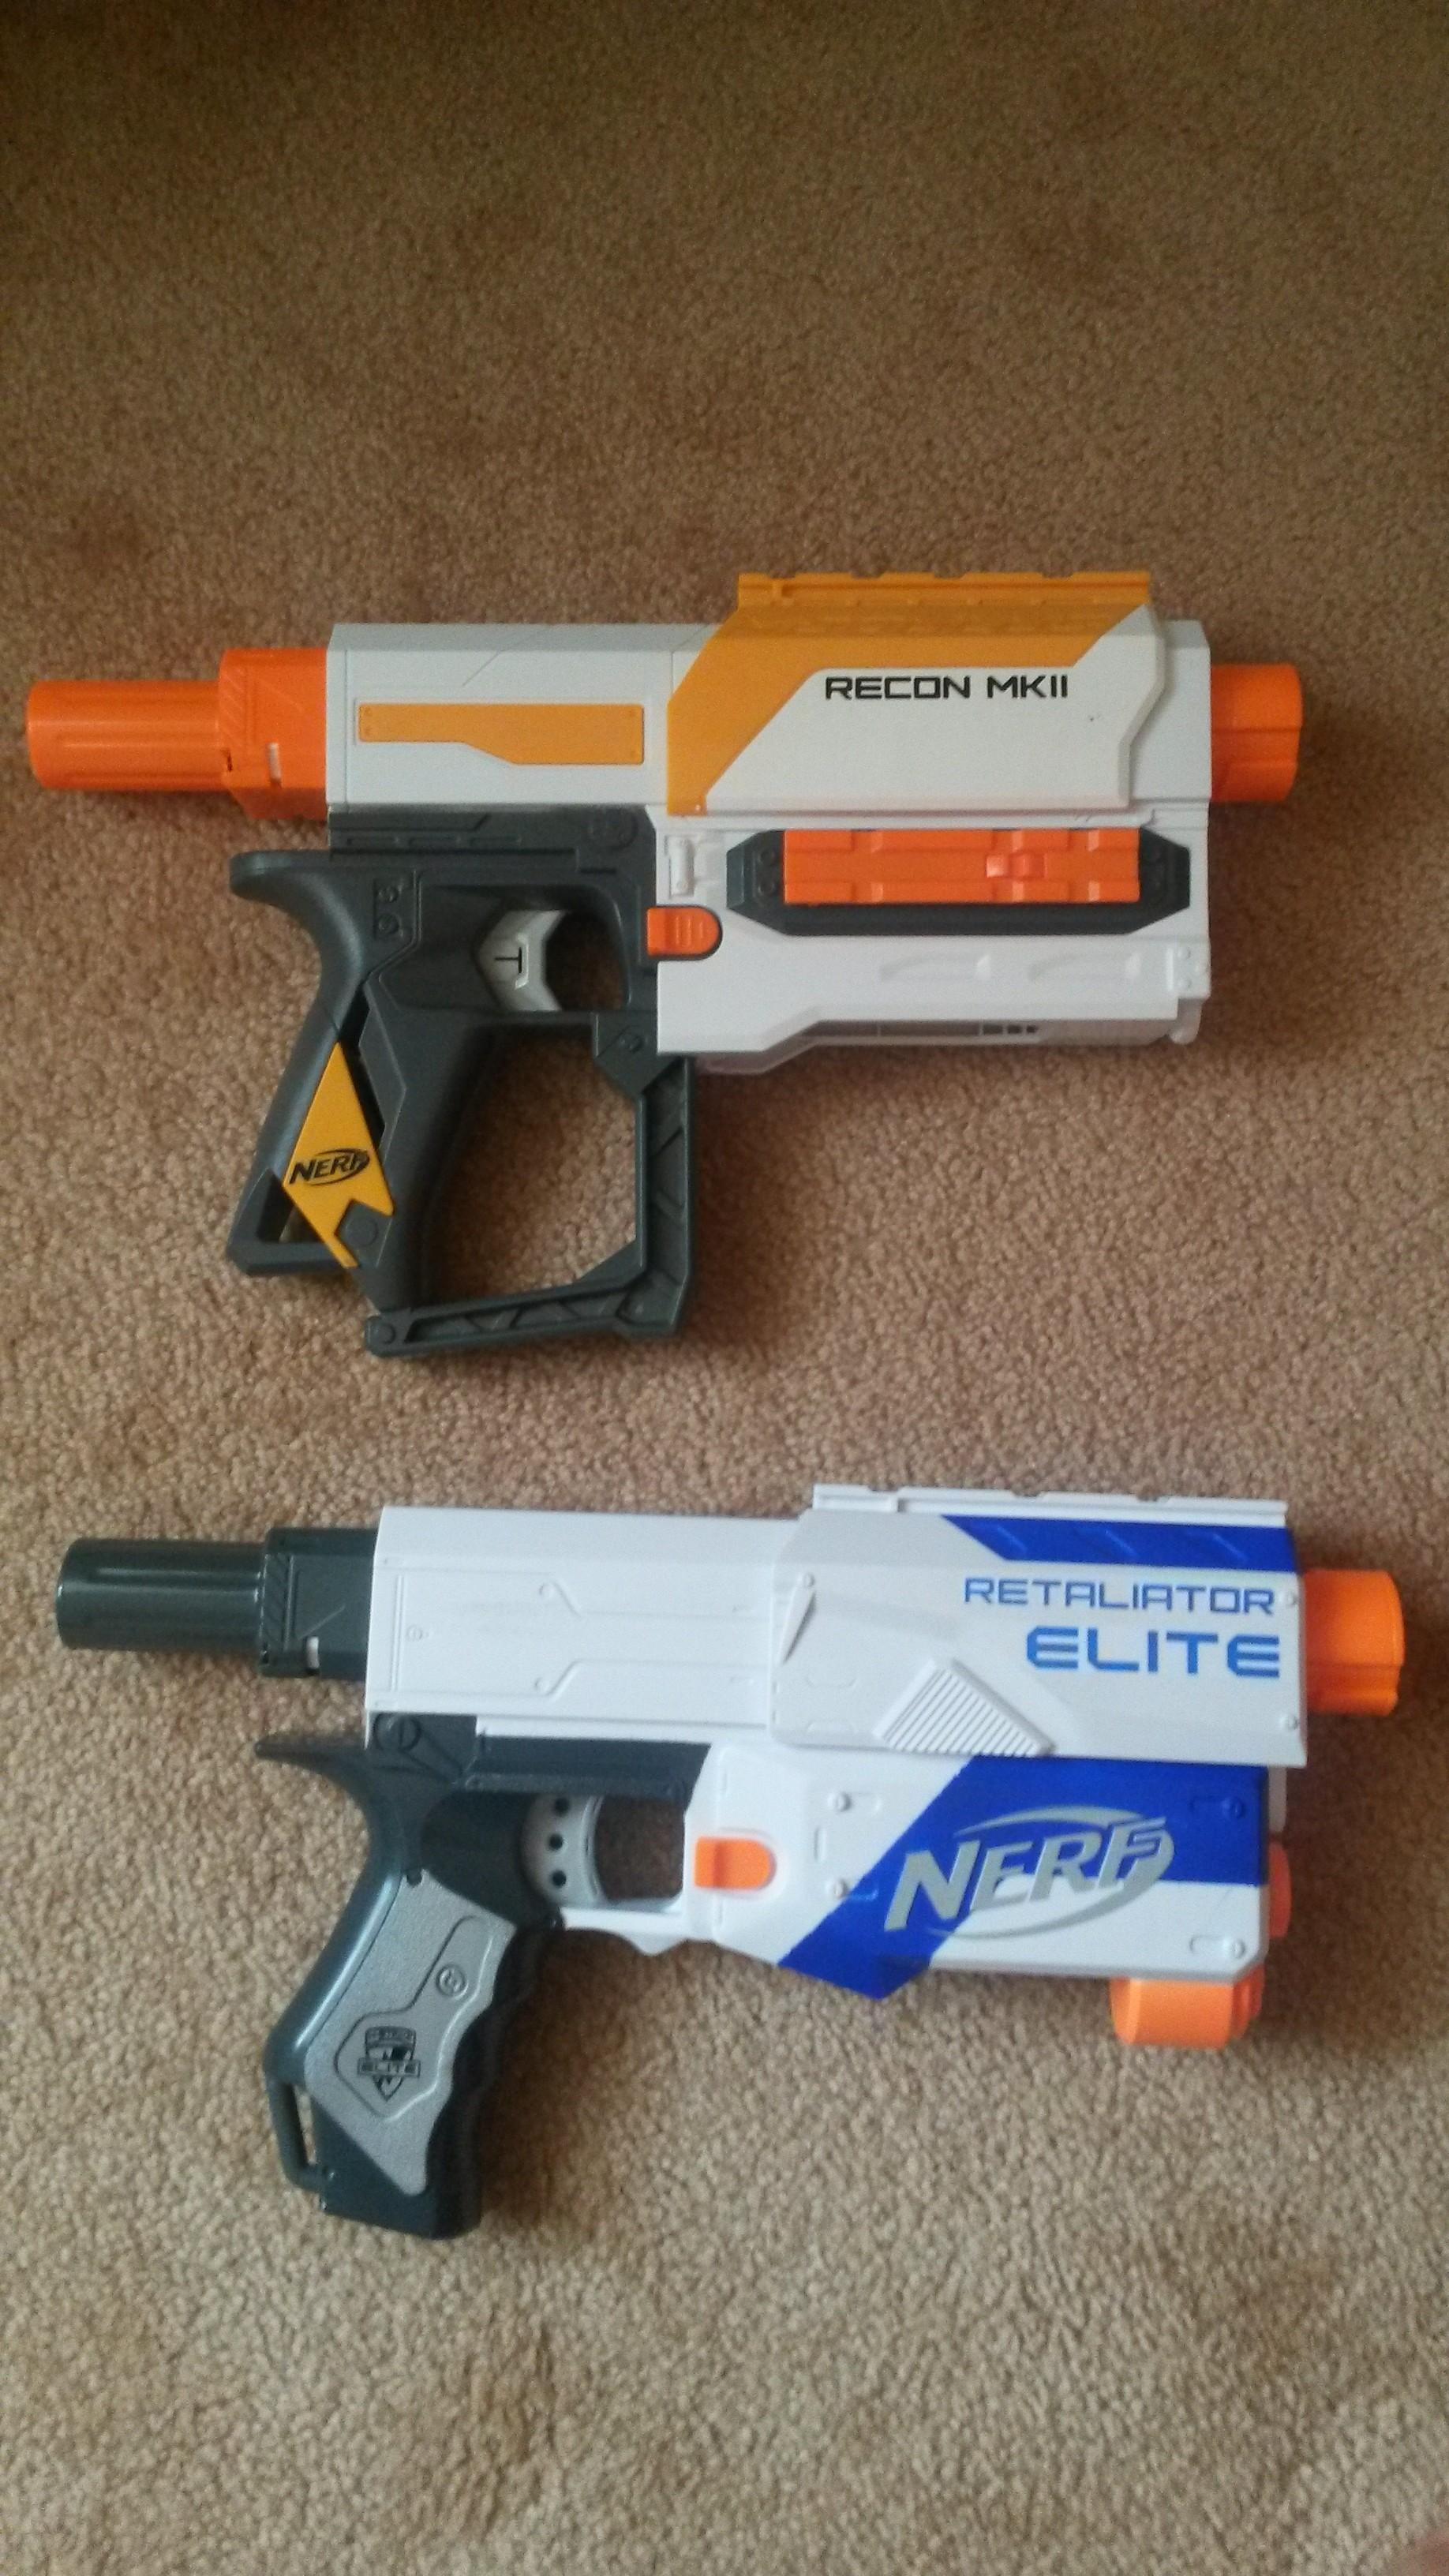 Review Nerf Modulus Recon Mkii 21m Aus Grey Trigger